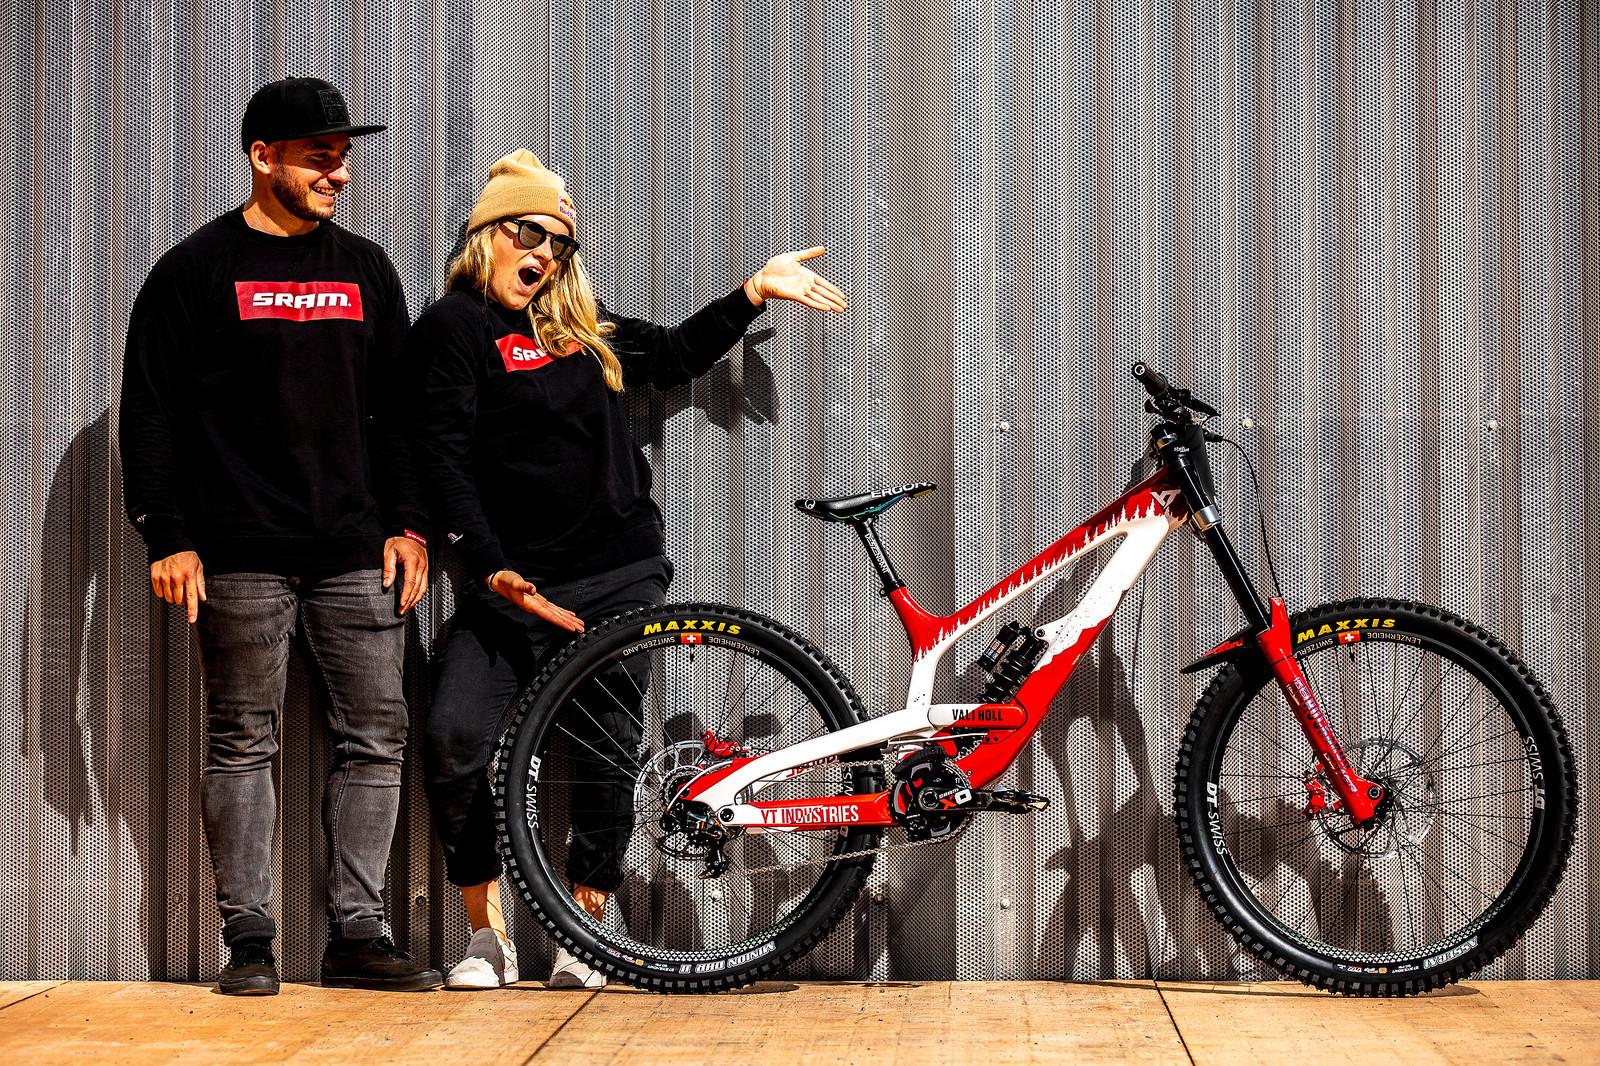 Vali and Matt with the World Champs Bike - WORLD CHAMPS BIKE - Vali Holl's YT TUES - Mountain Biking Pictures - Vital MTB